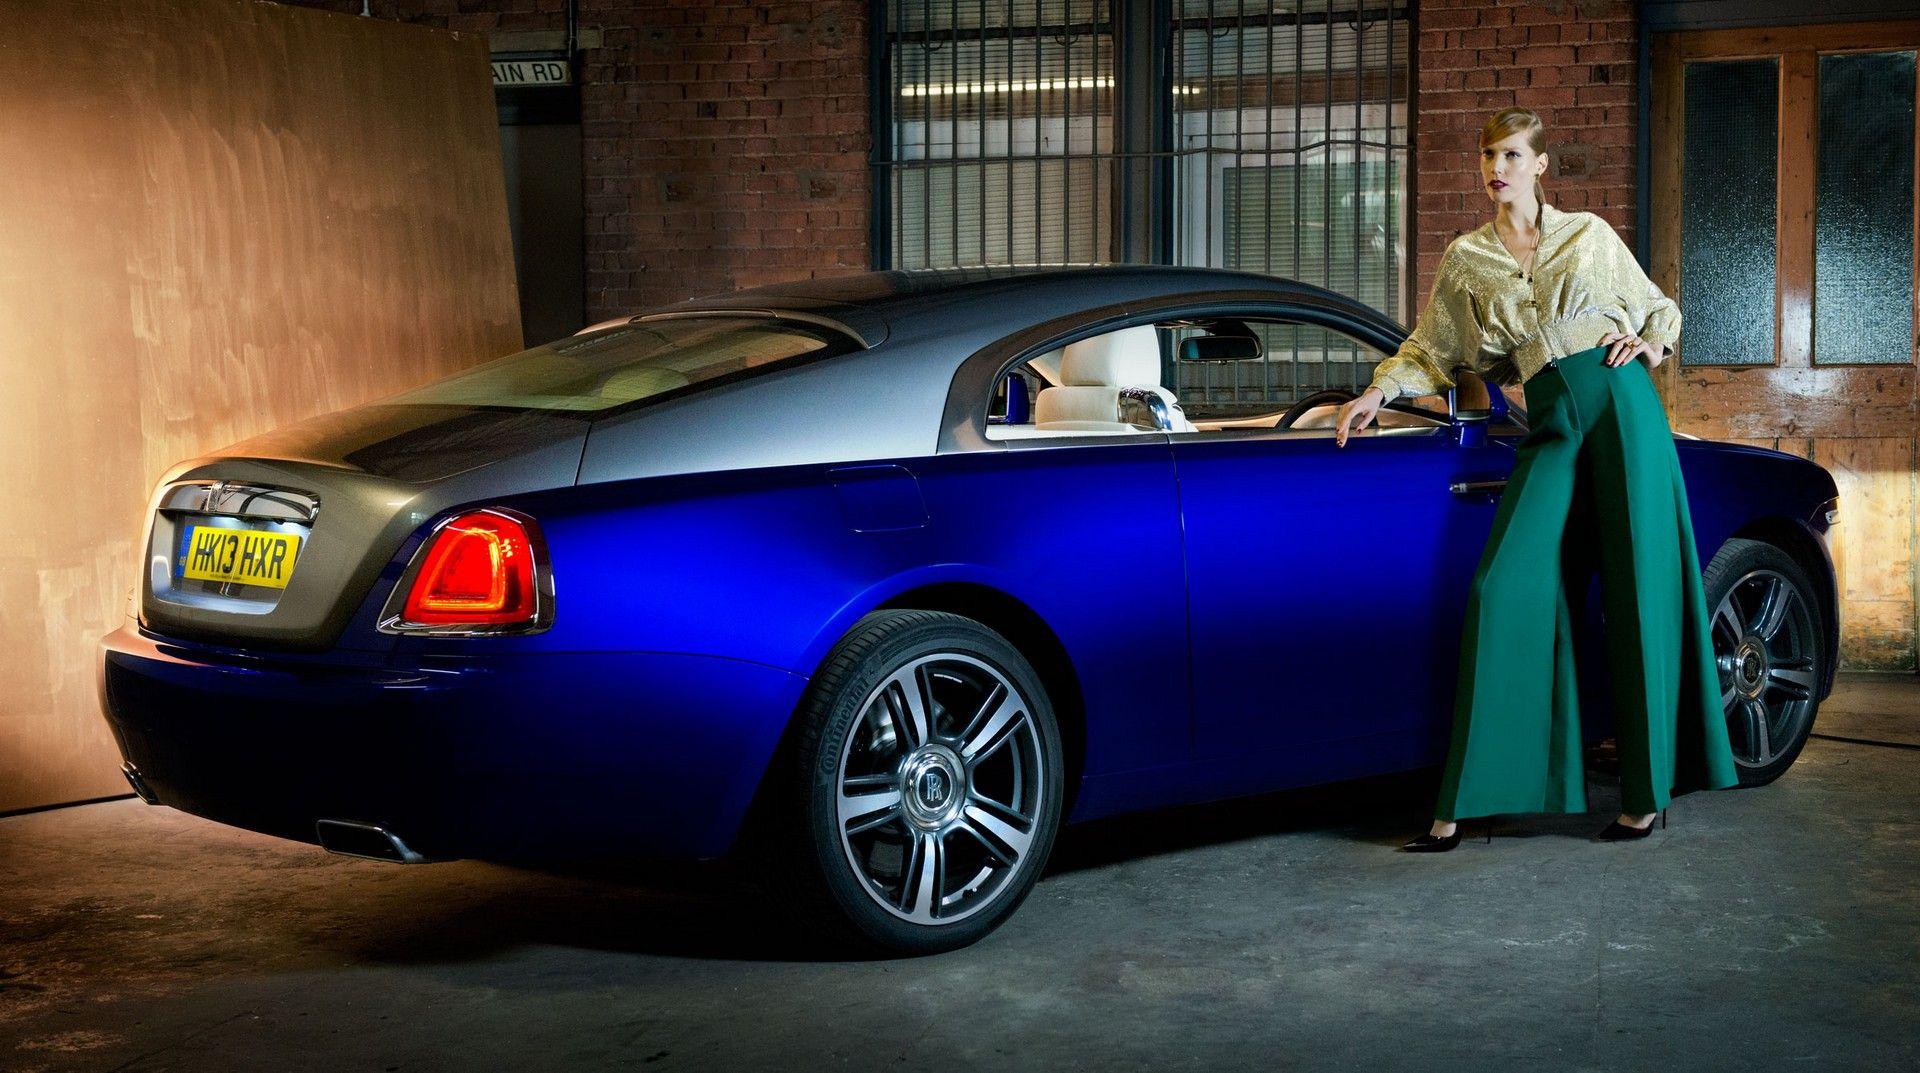 Phantom Girl Wallpaper Hd Girl And Rolls Royce Wallpaper Girl And Rolls Royce